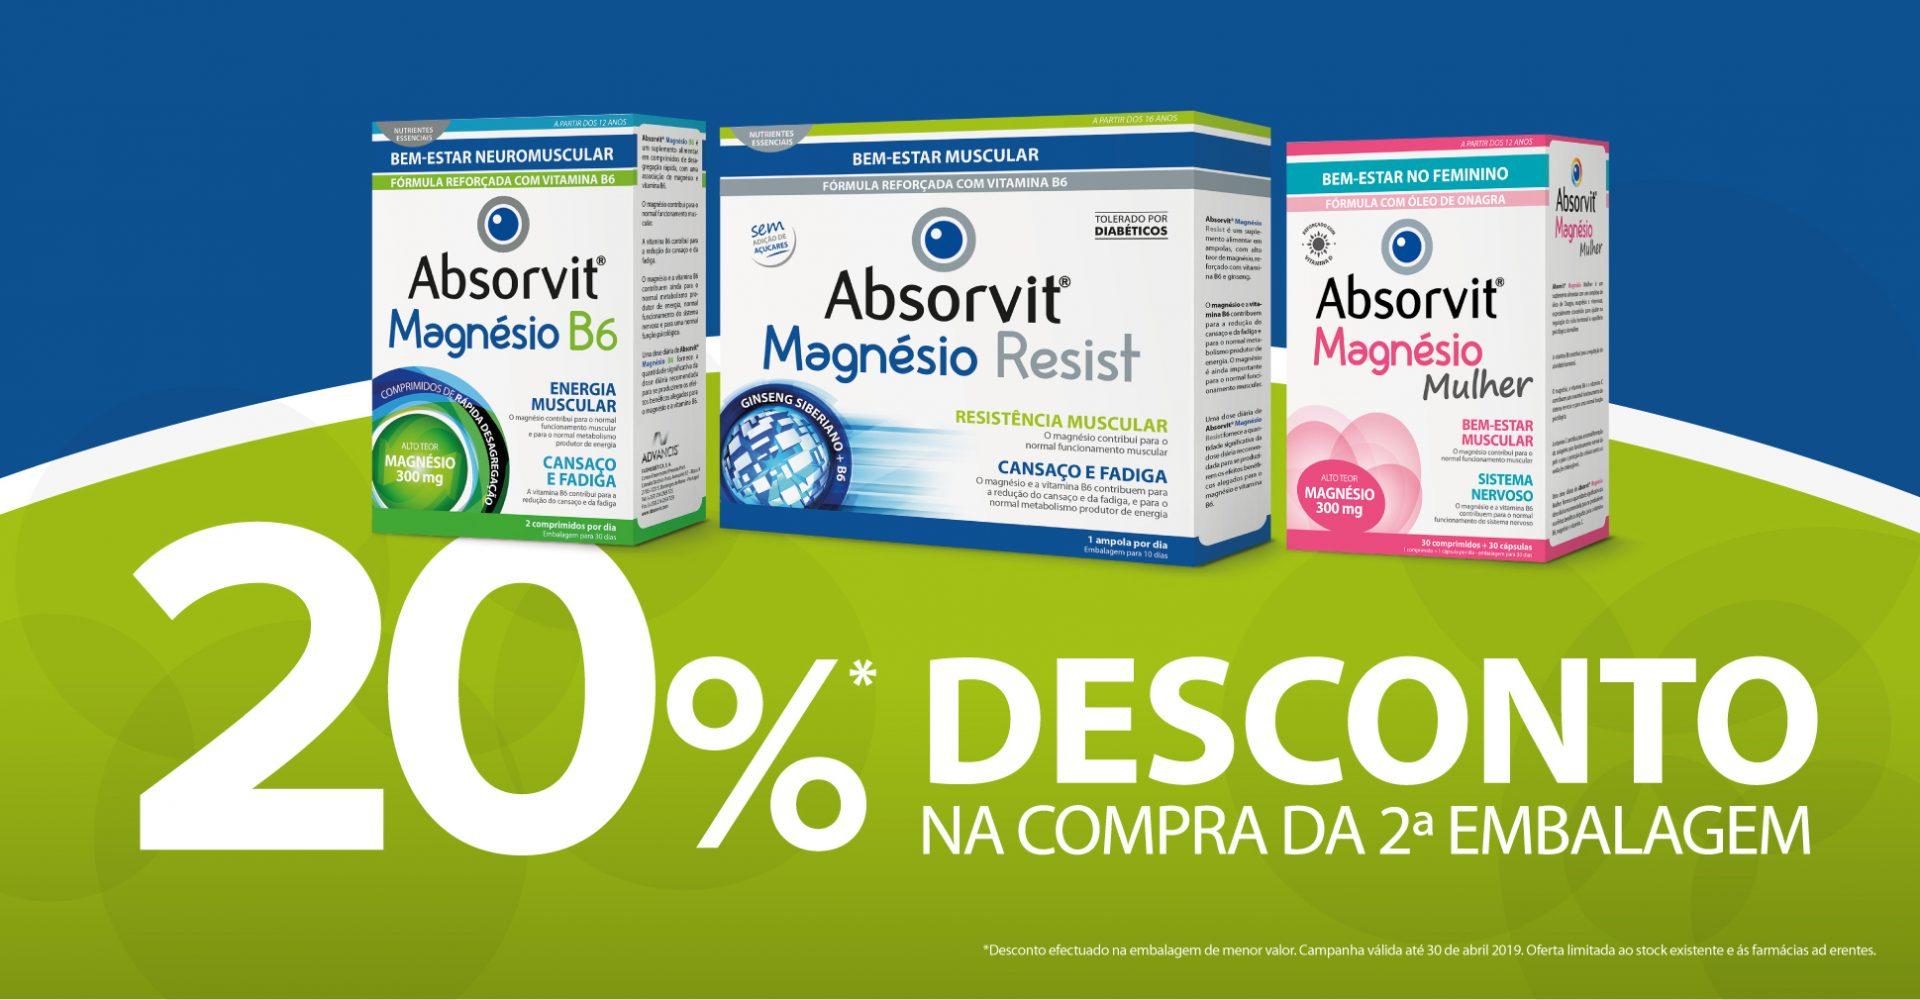 20%Desconto Absorvit Magnésio